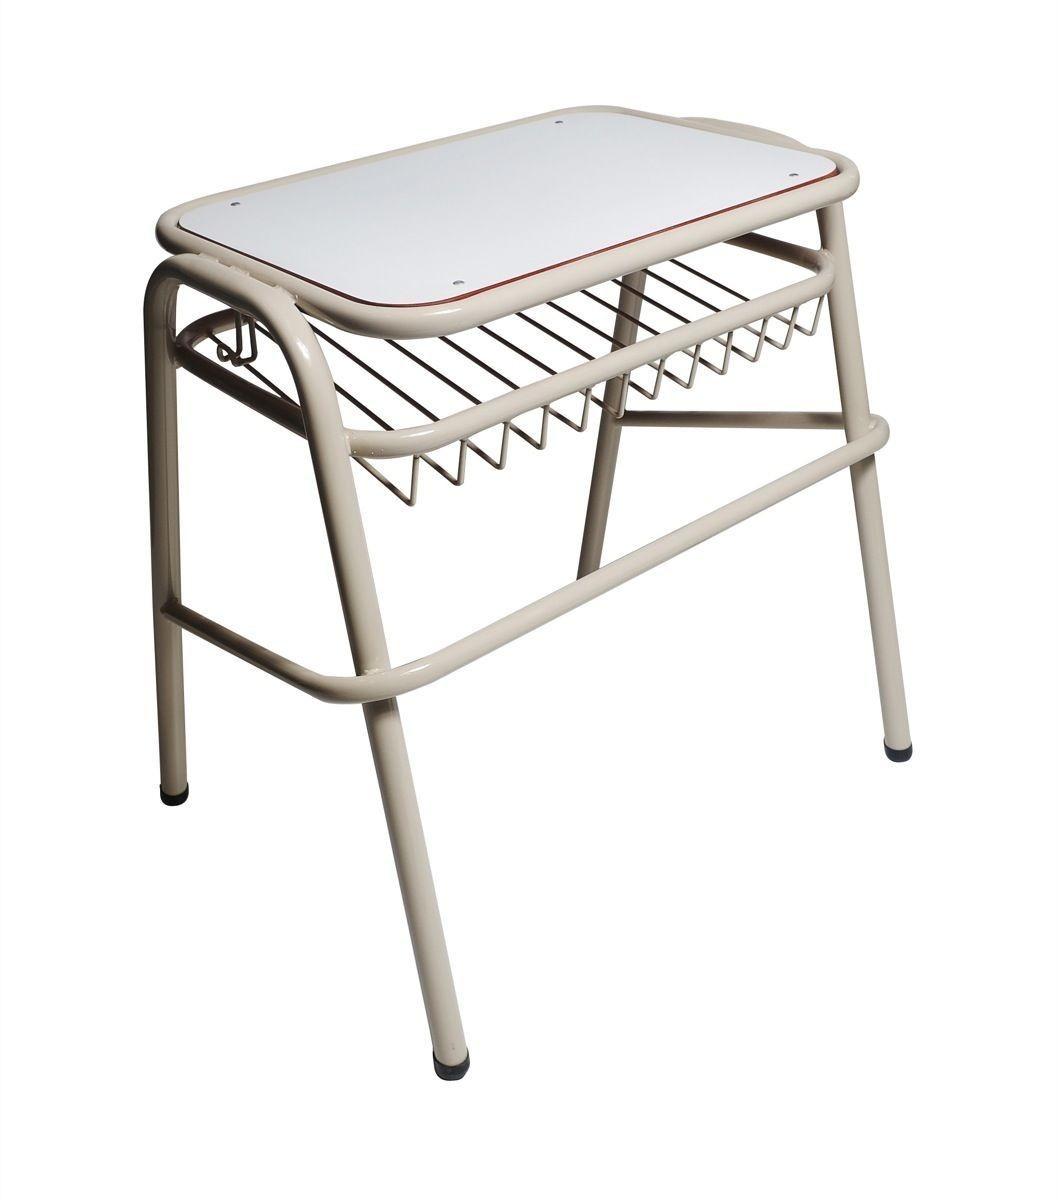 Pupitre Unipersonal Muebles Escolares Envios A Todo El Pais  # Muebles Pupitres Escolares